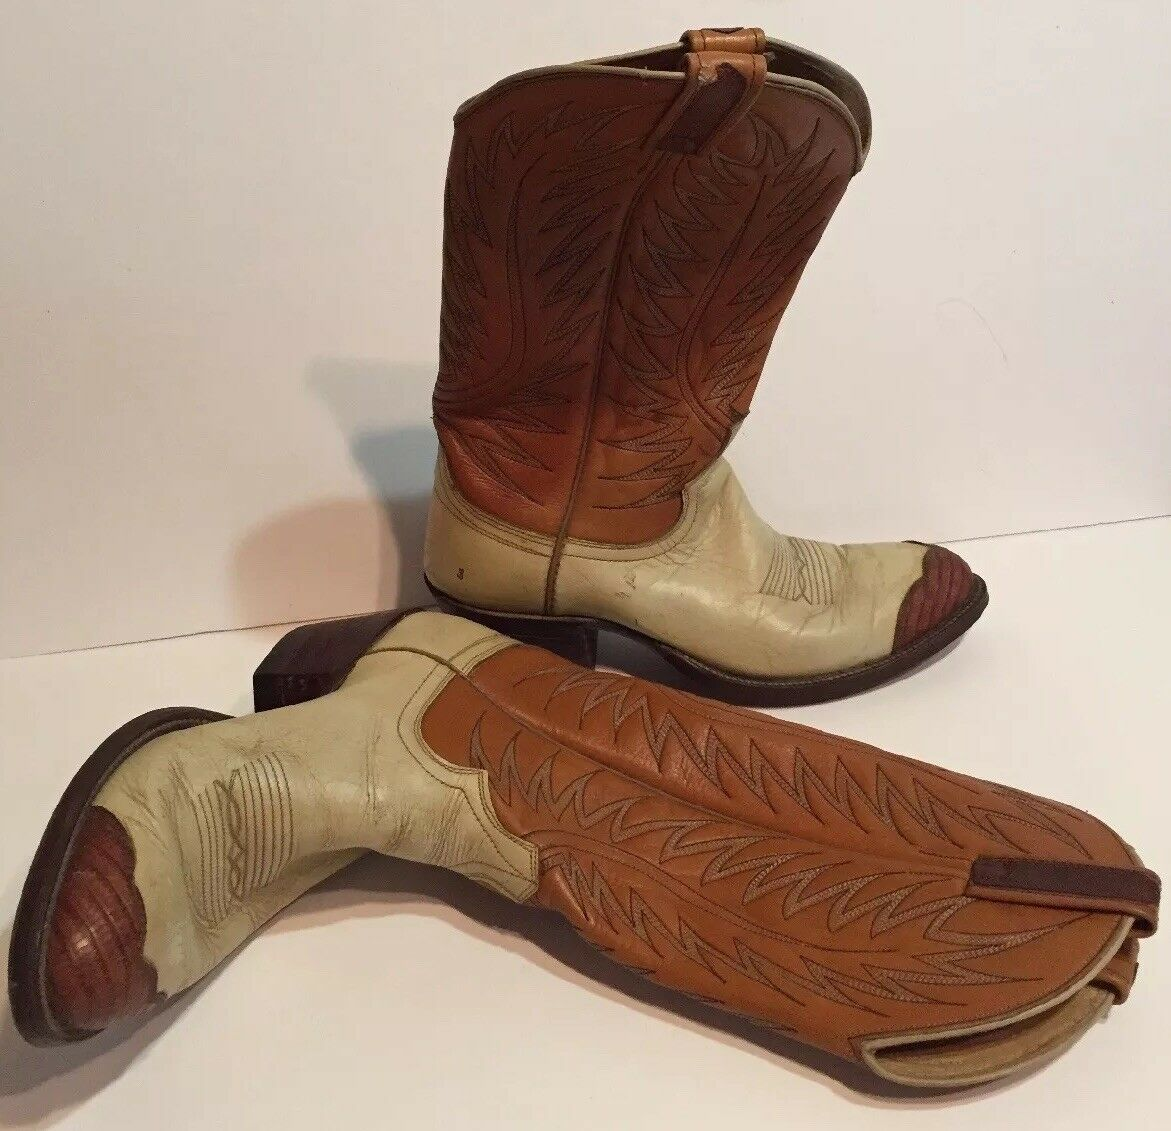 Vintage Dan Post Womens Cowboy Boots Size 7.5 D White Tan